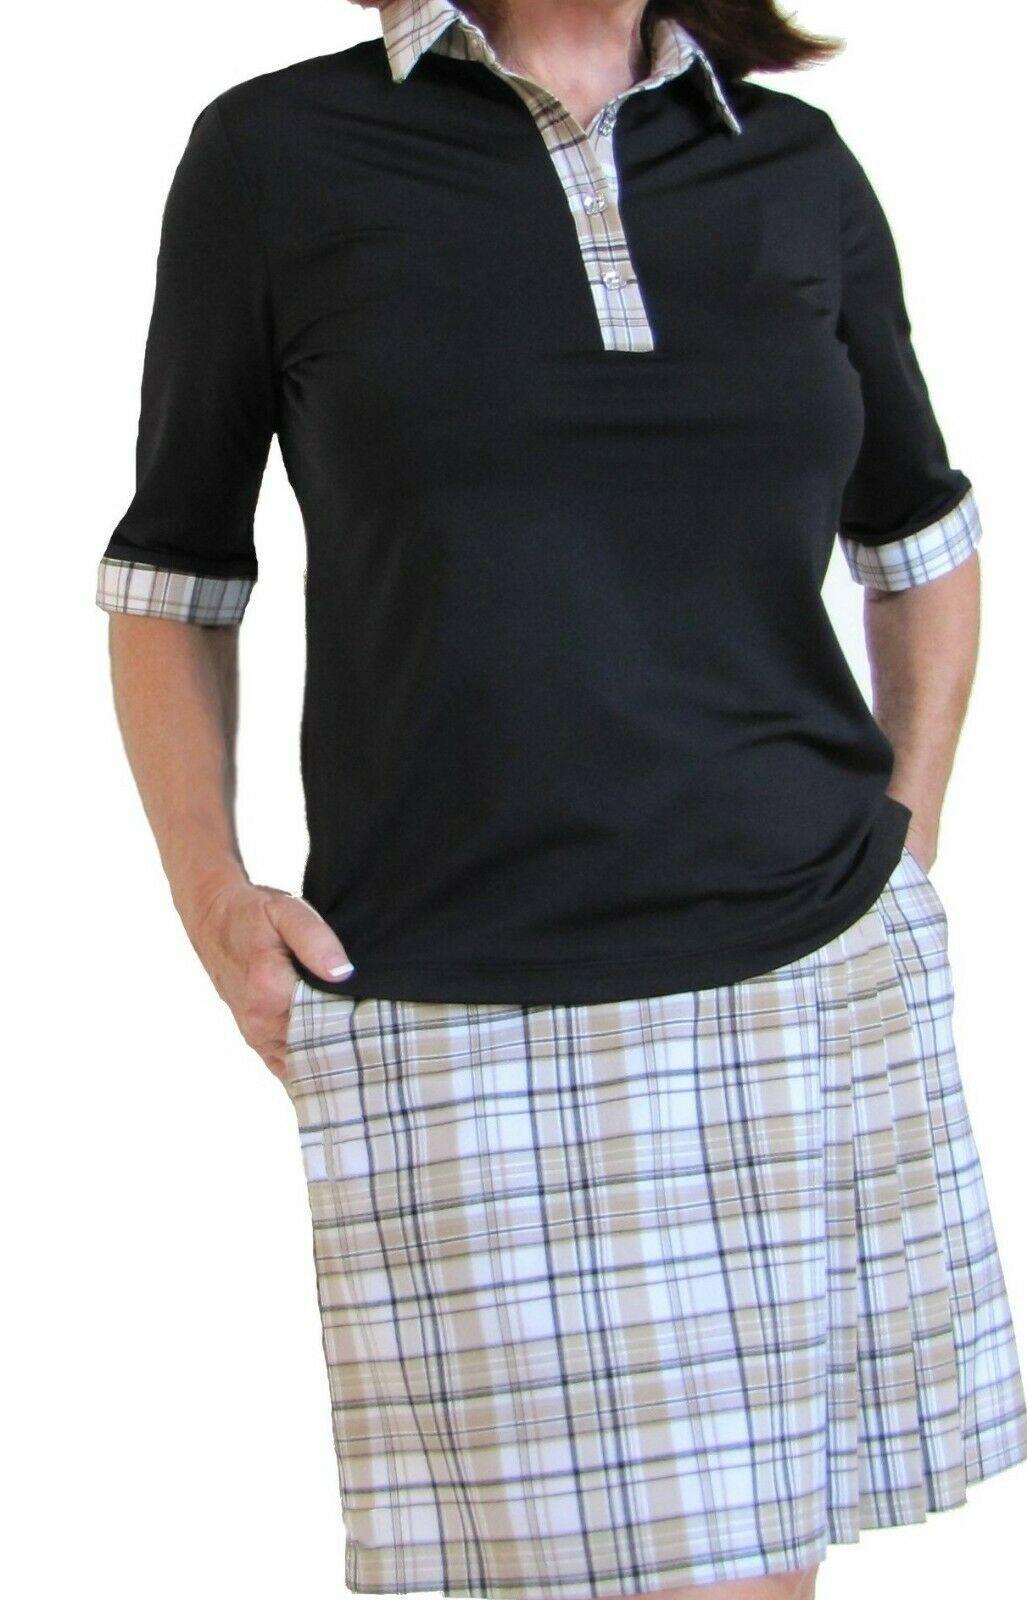 Stylish Women's Golf & Resort Black Long Sleeve Collar Top, Swarovski Buttons  image 4